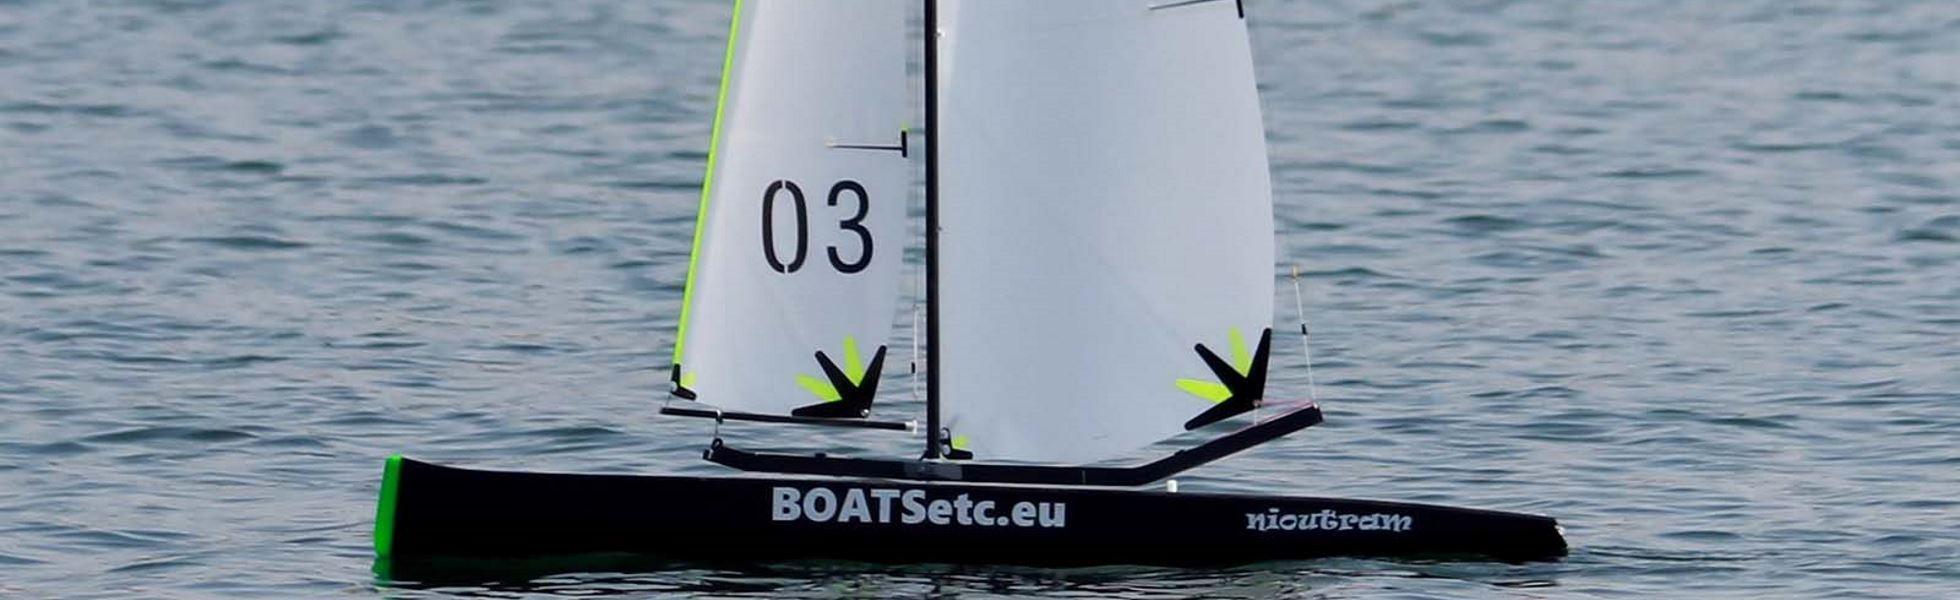 BOATSetc high performance carbon RC sail boats